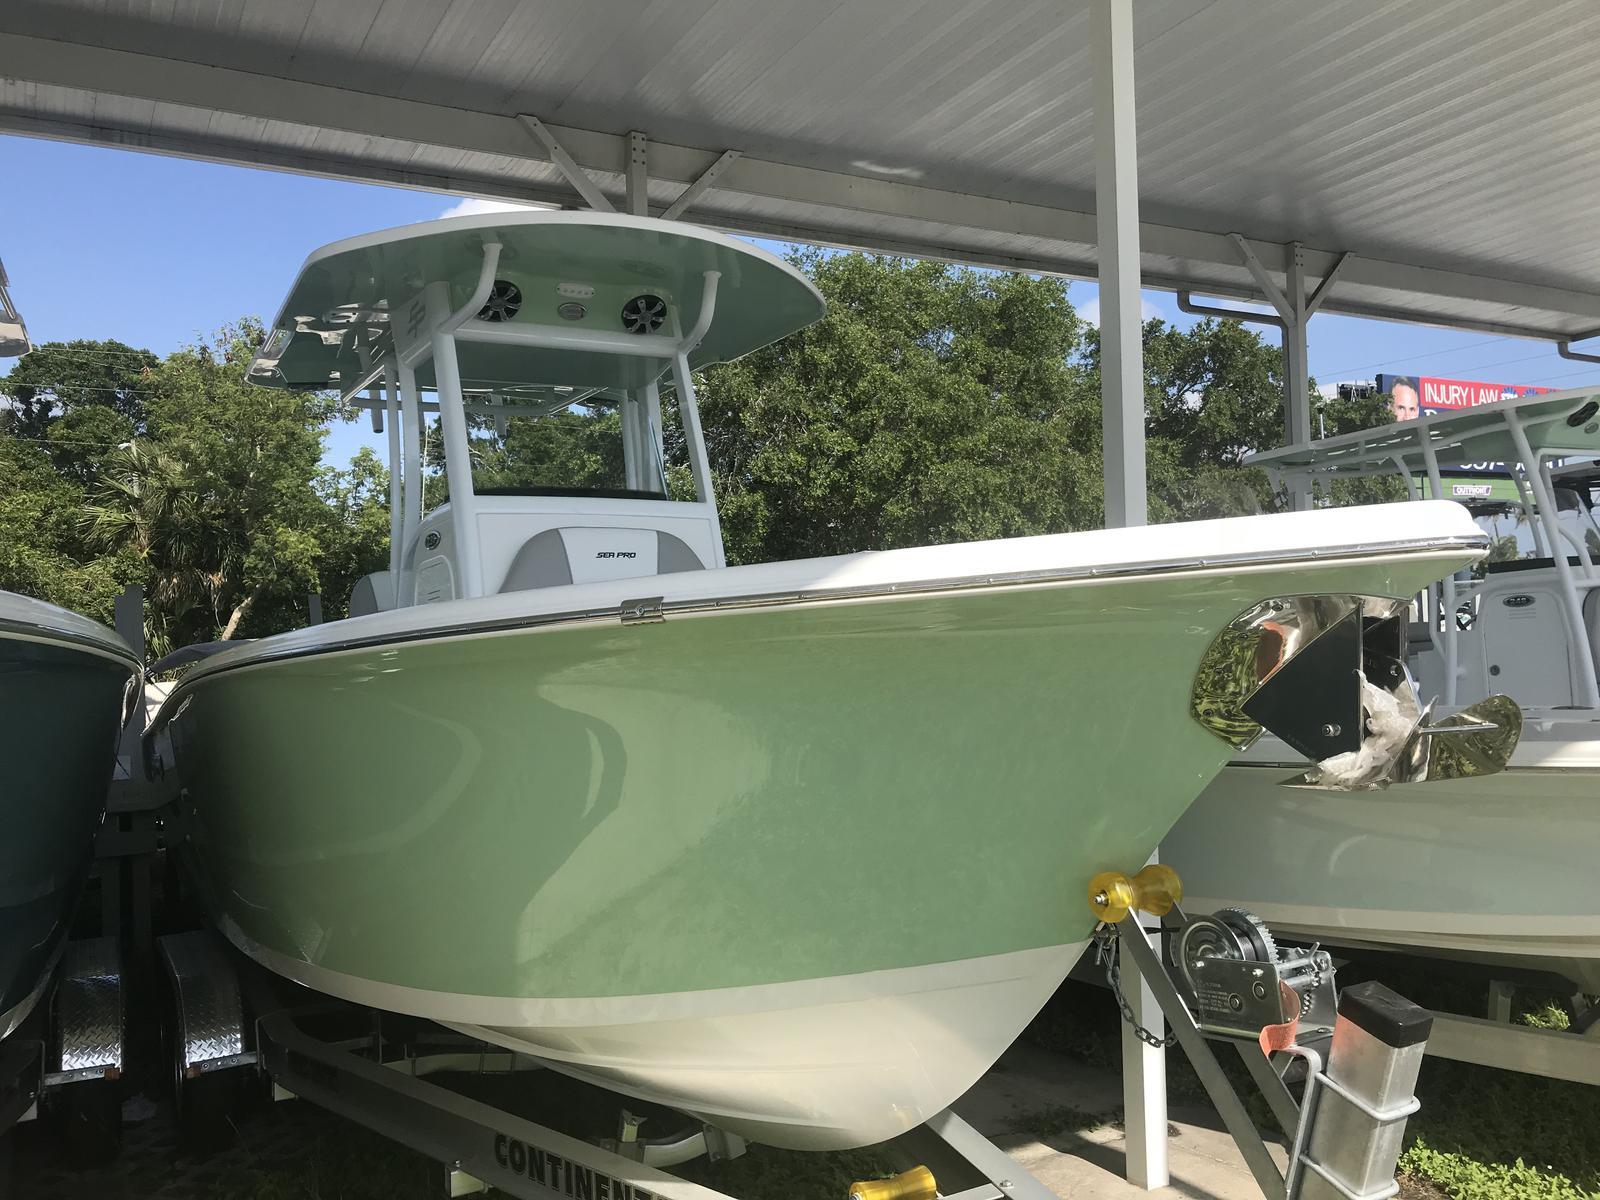 Sea Pro 239 Deep V Series